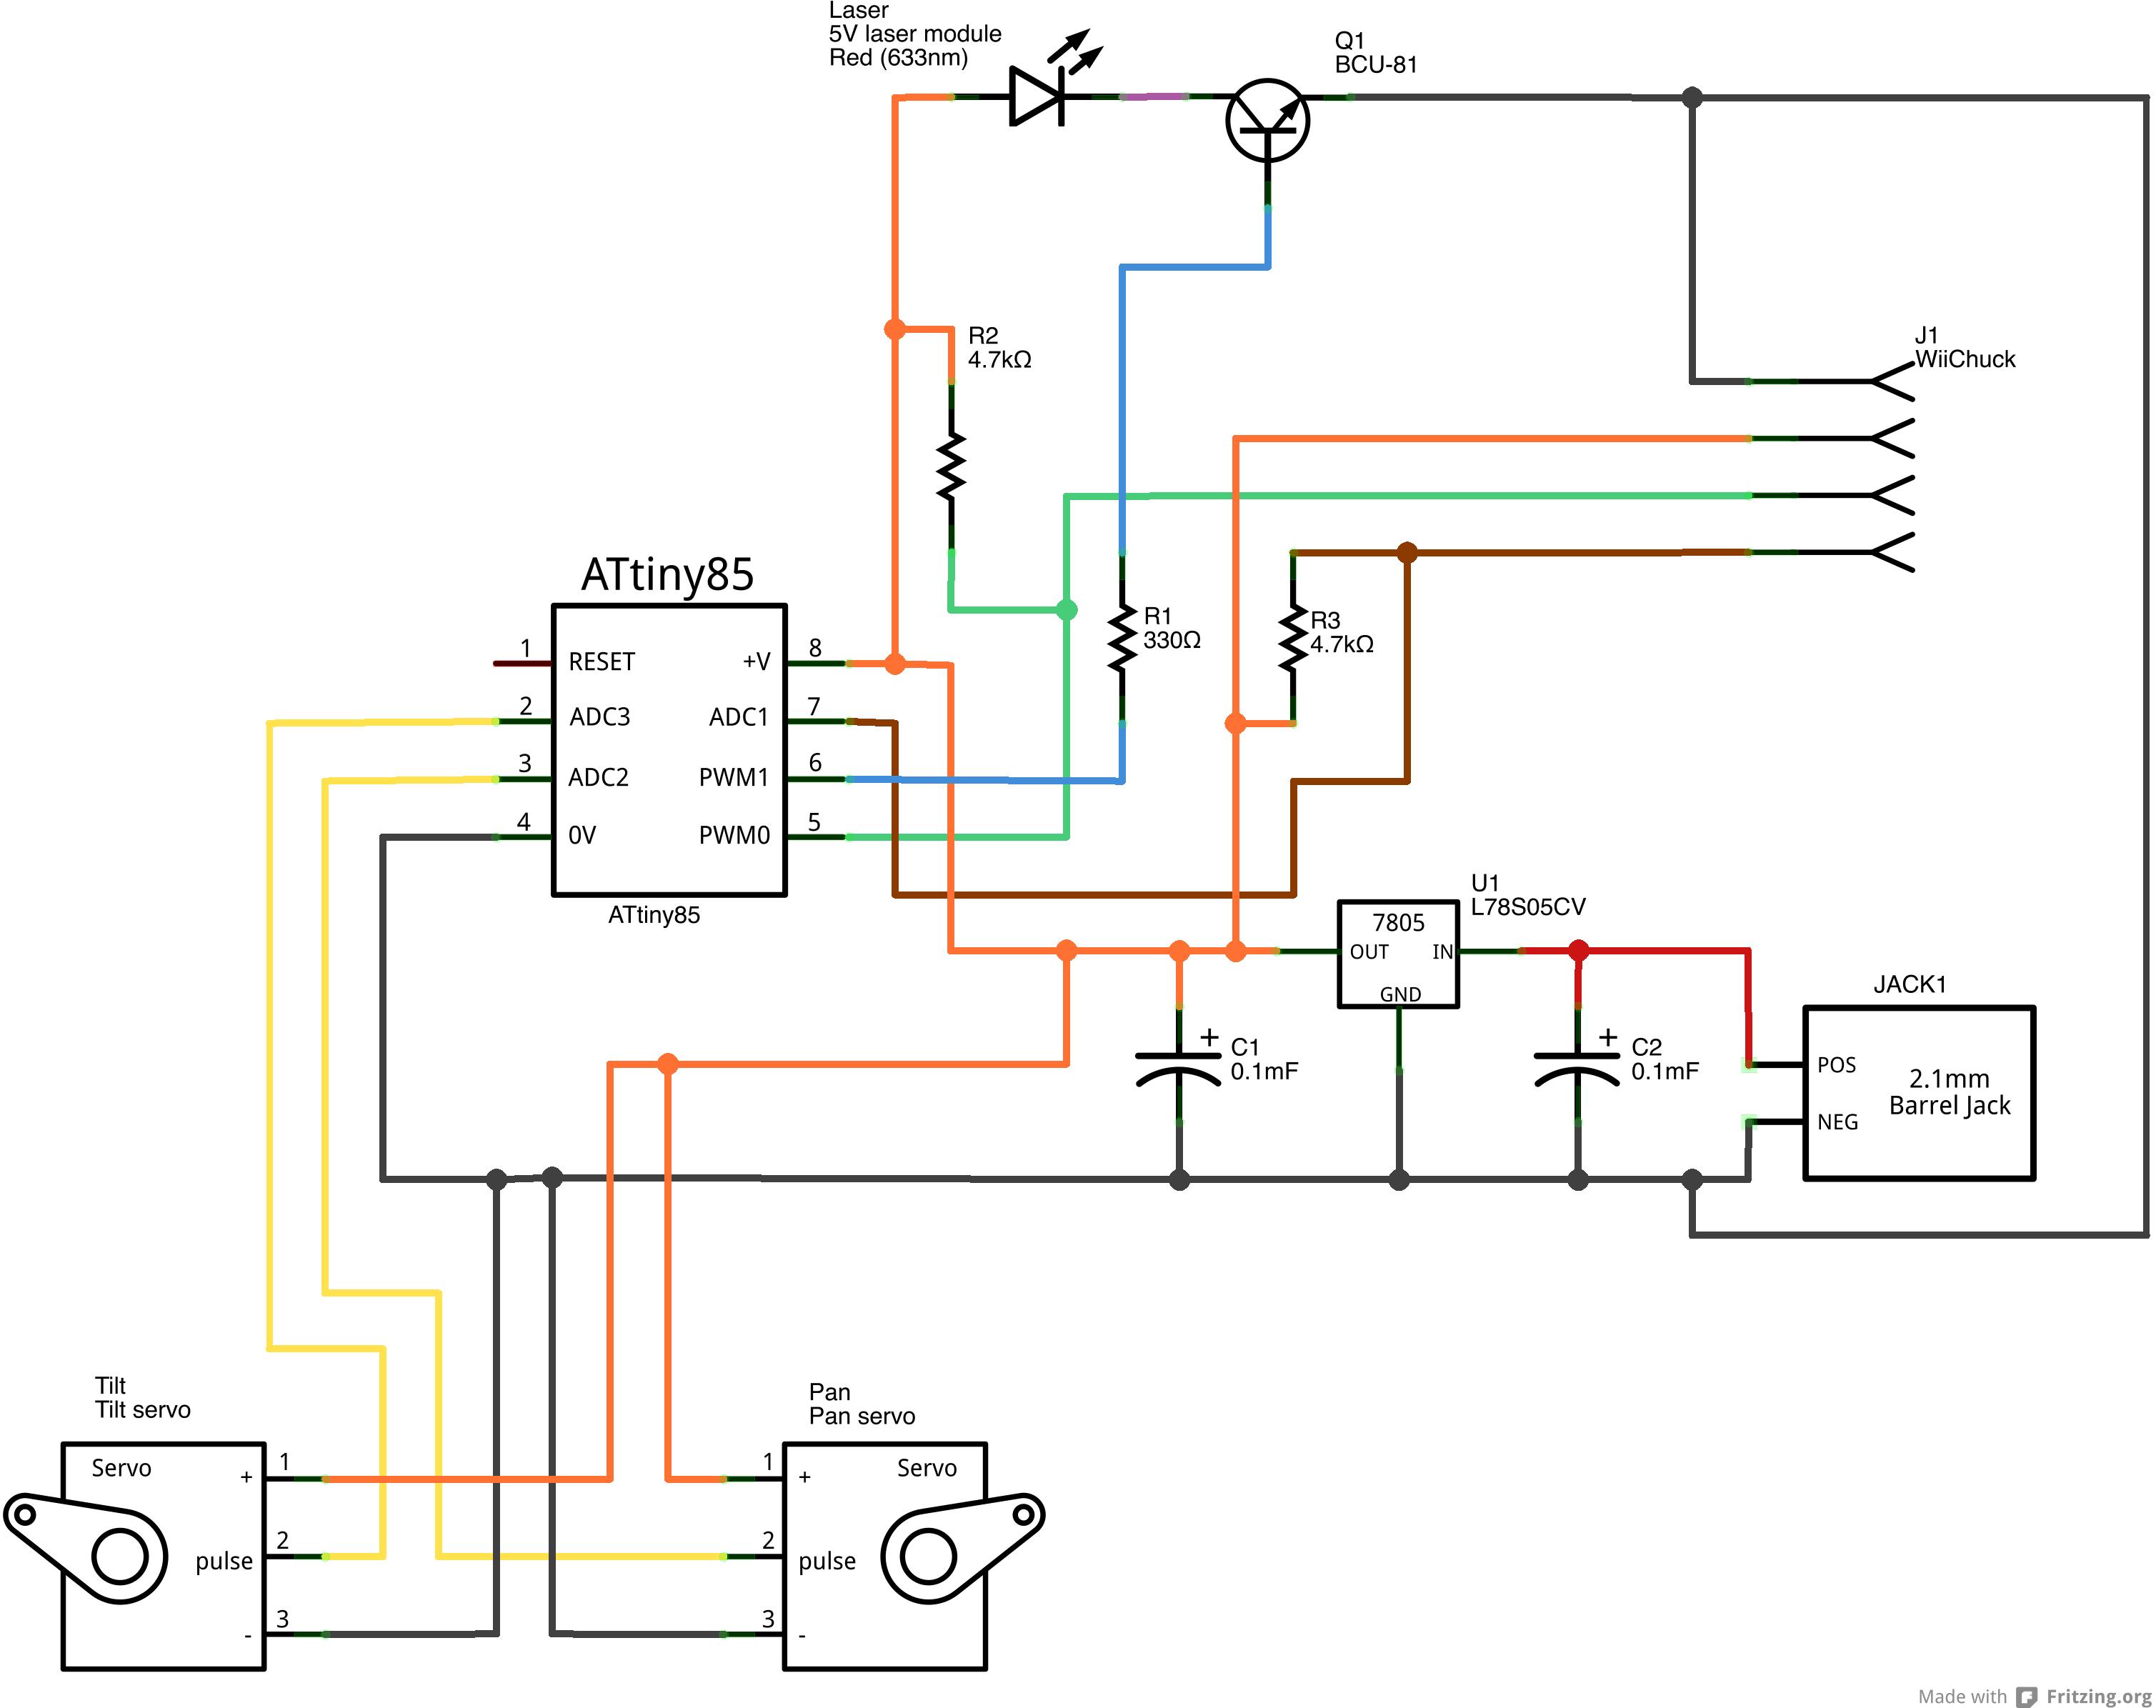 tinylaserturret an attiny85 a laser module a wii nunchuck and some servo motors [ 3018 x 2391 Pixel ]